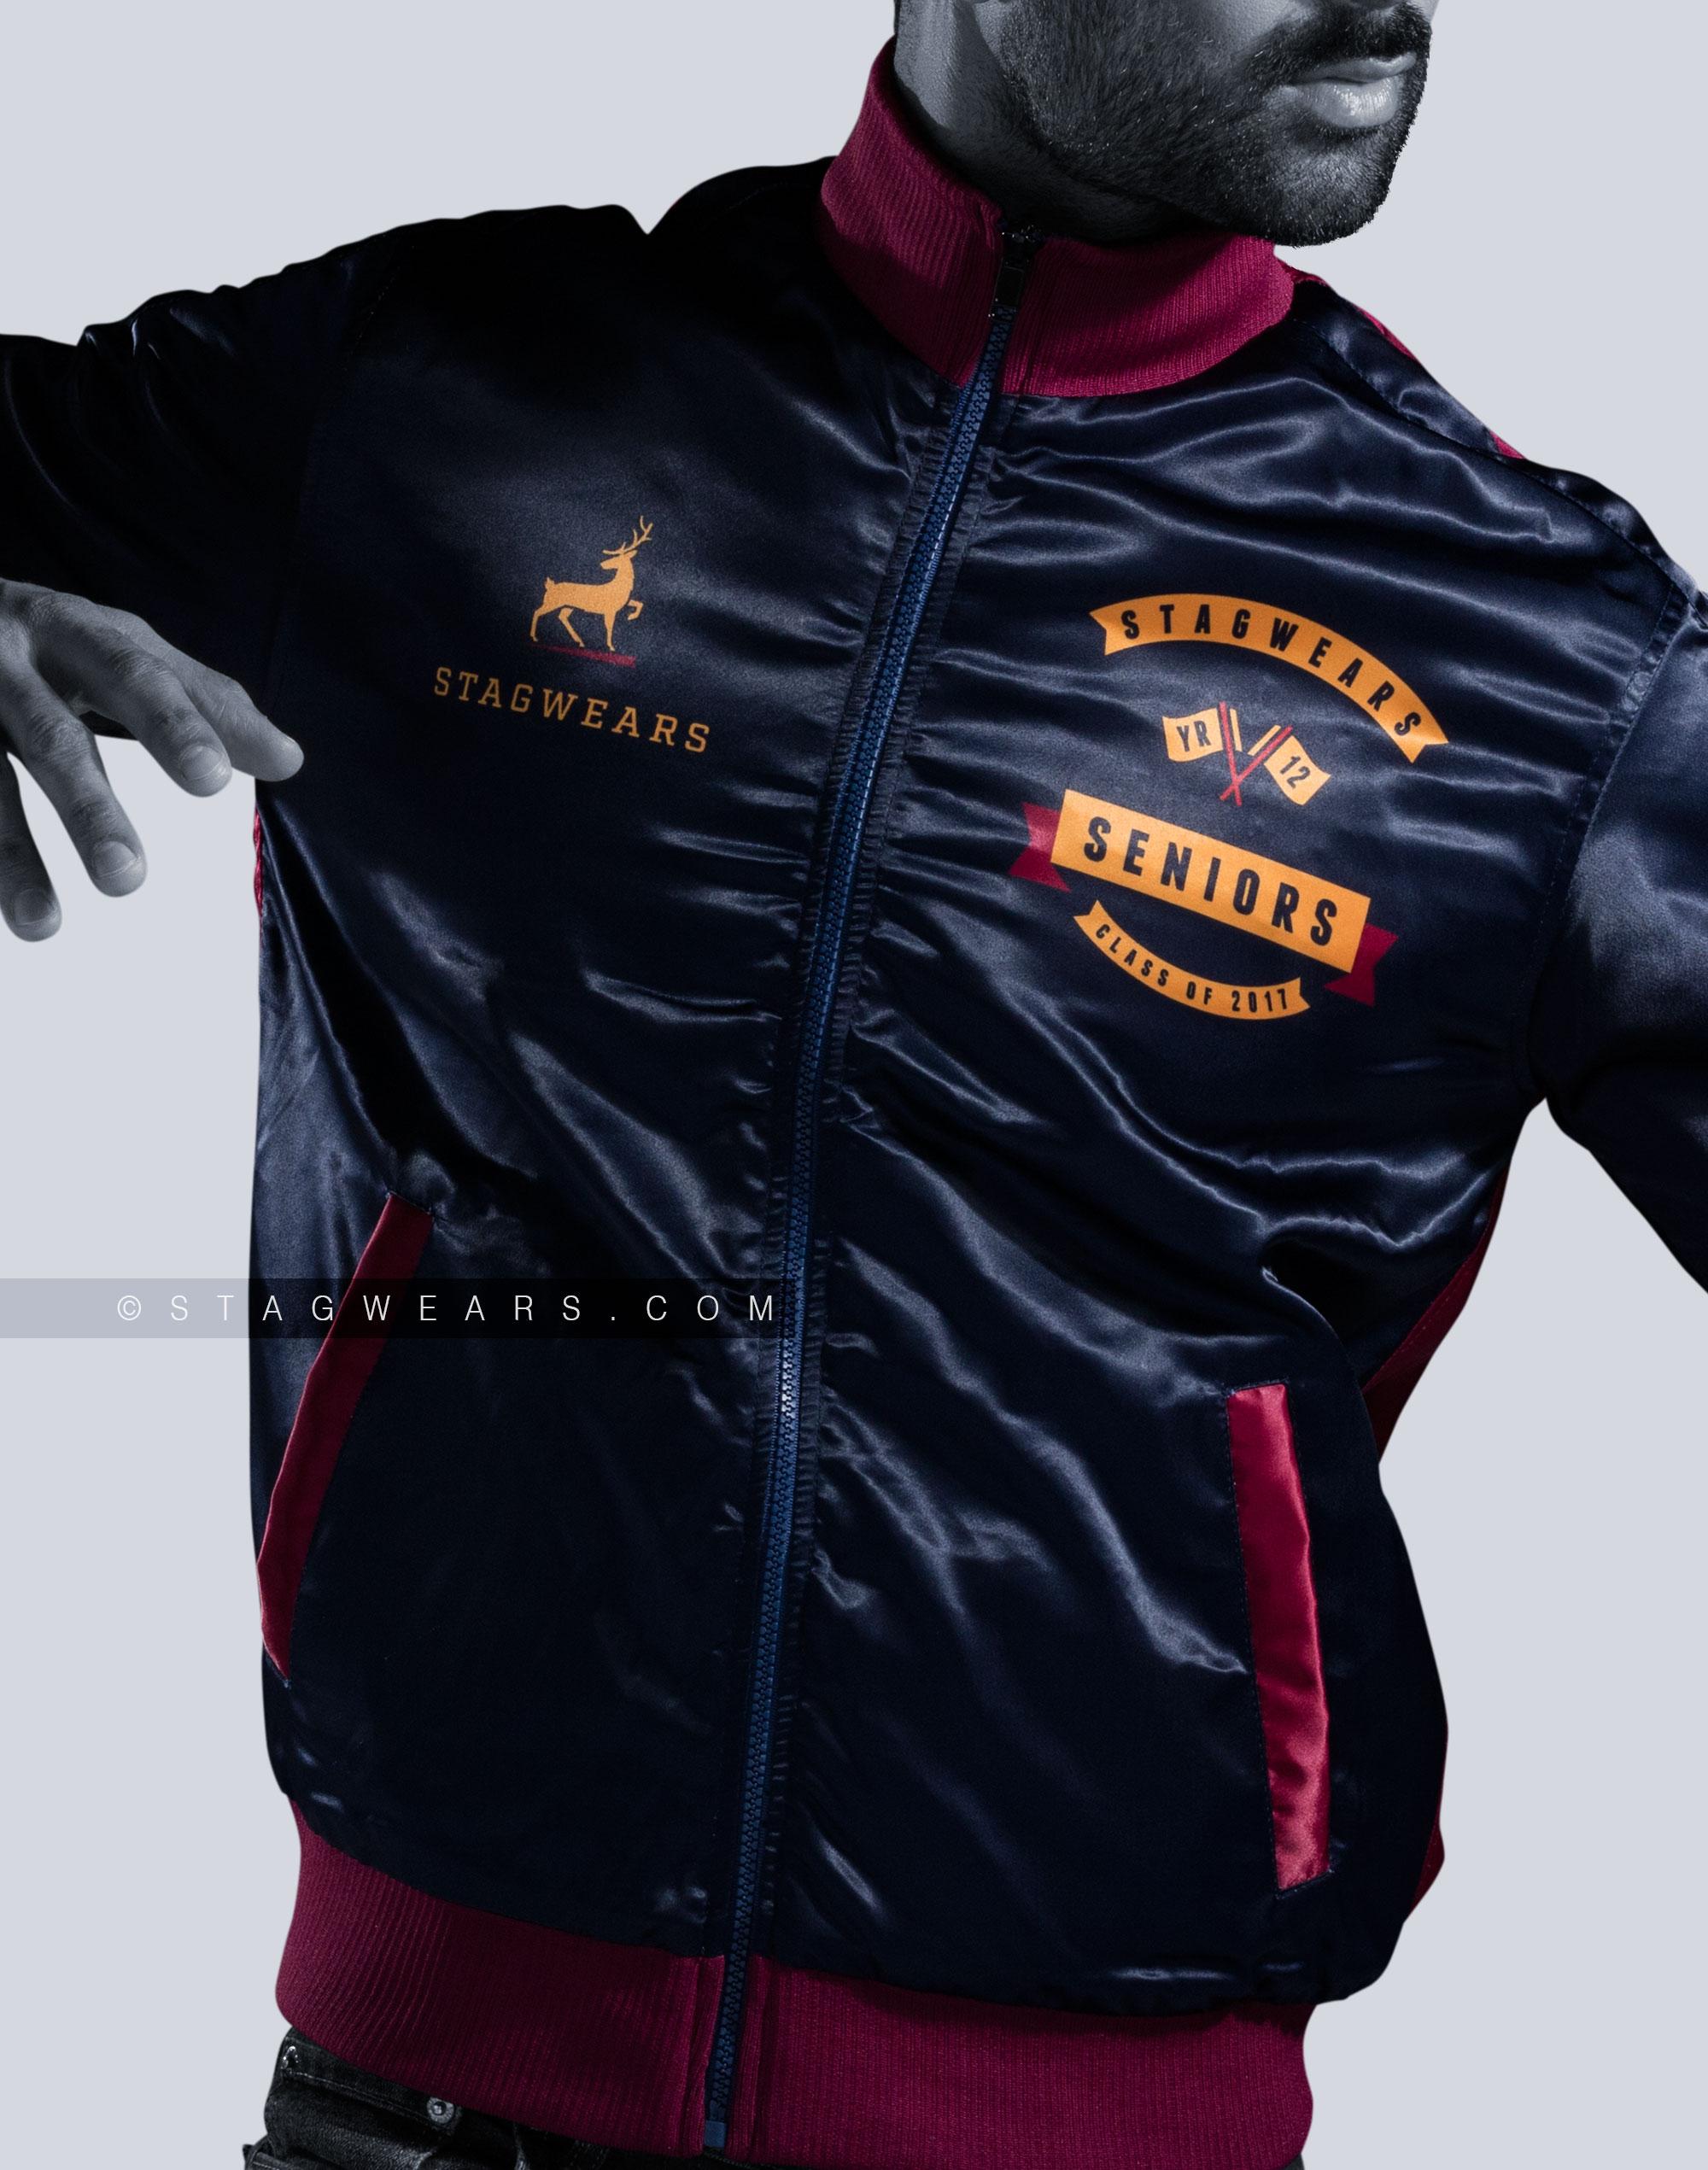 096629630deb Custom Track Jackets Cotton Fleece Reversible Team Jackets